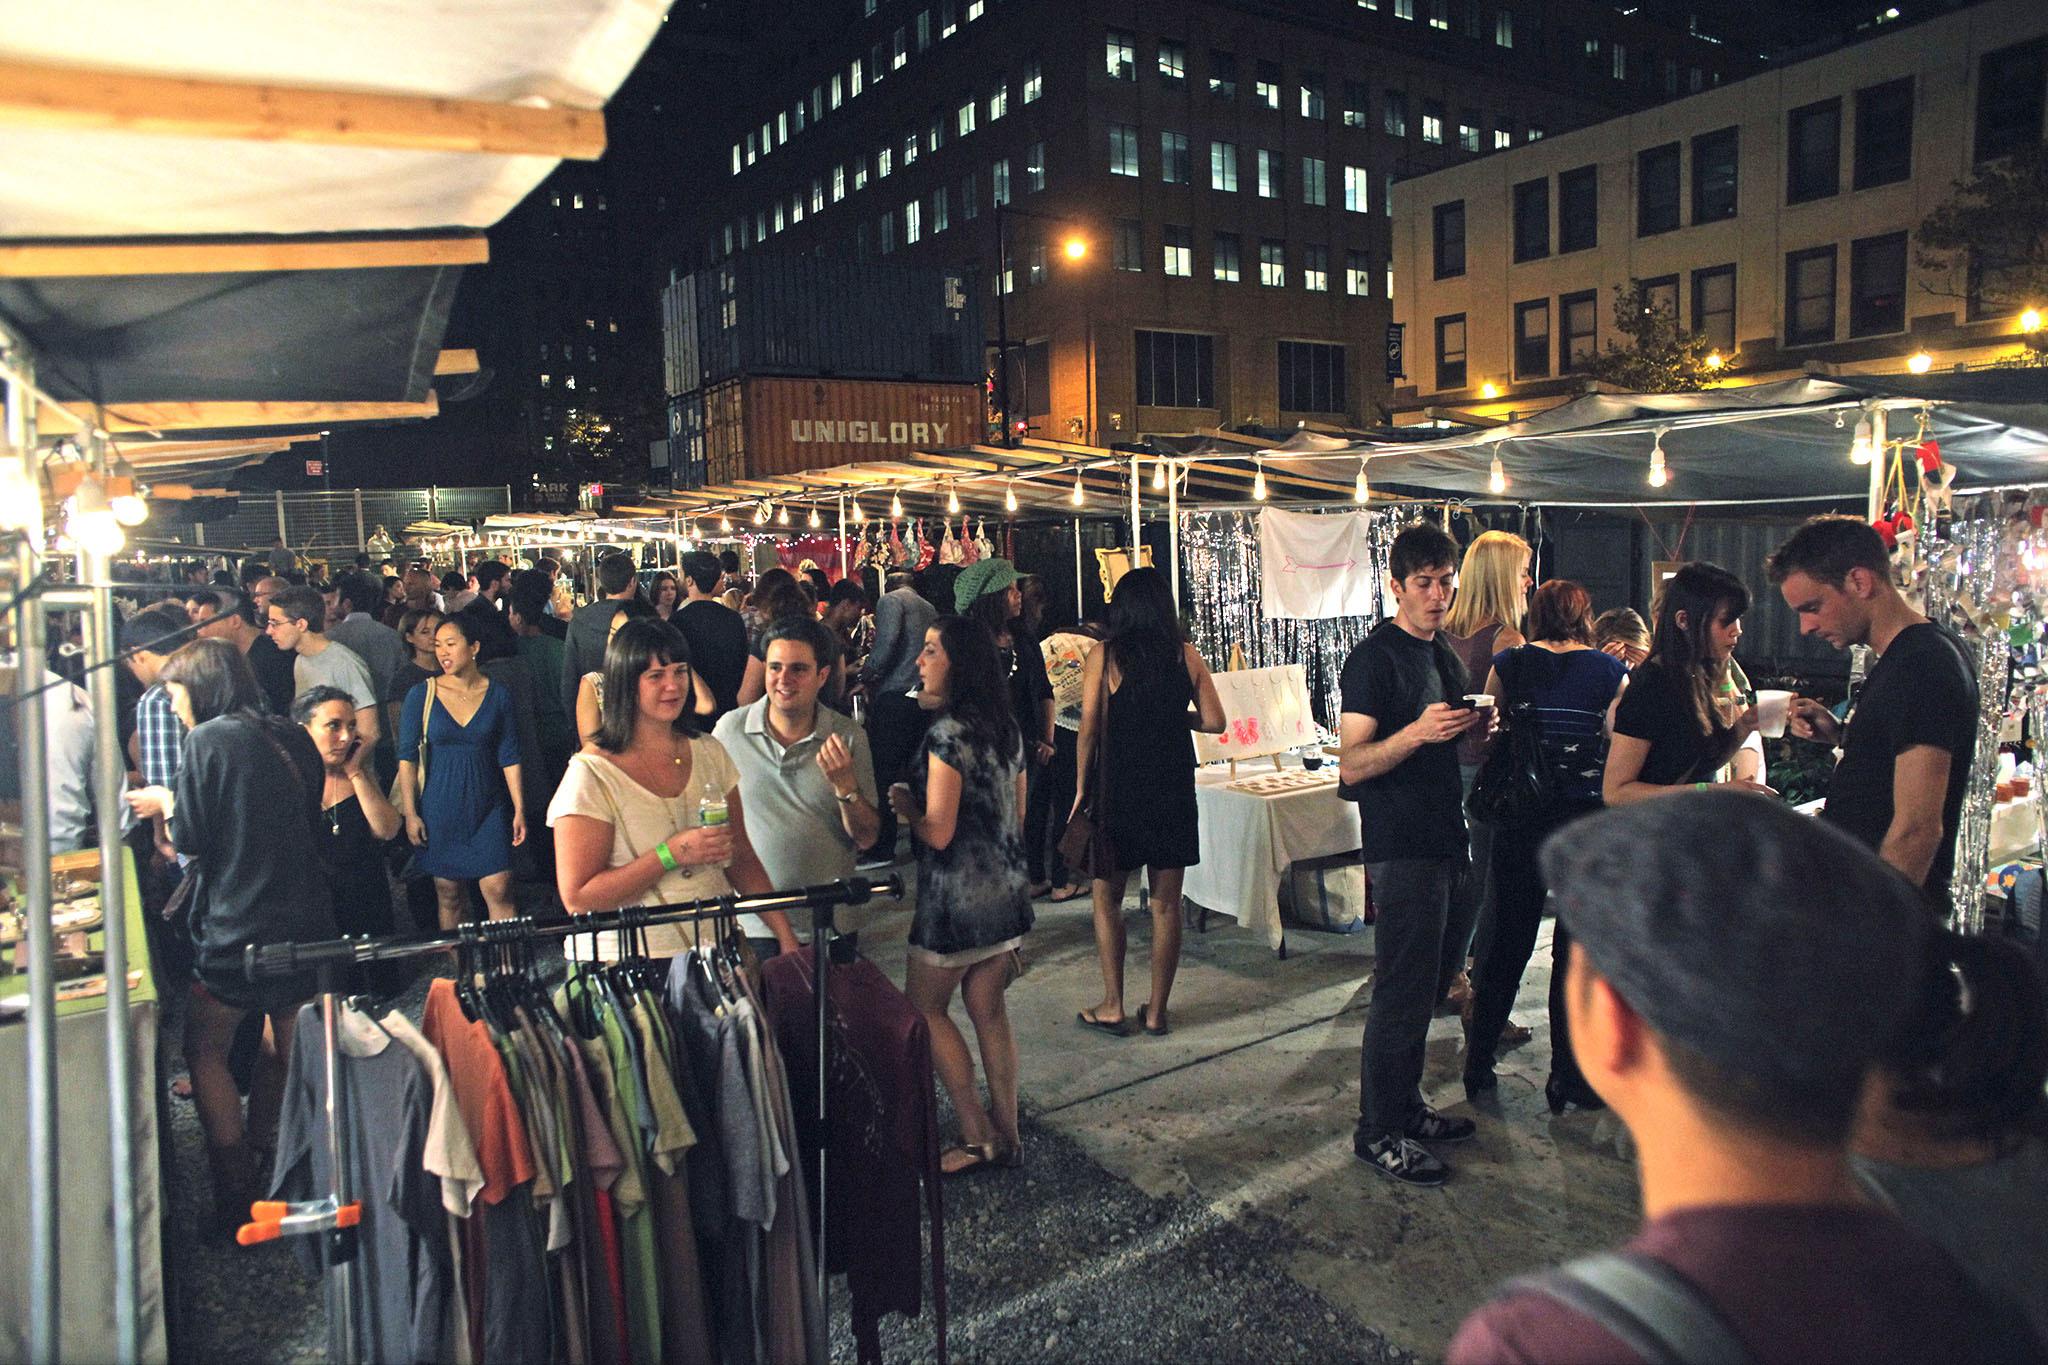 Shop, dance and eat at the Brooklyn Night Bazaar